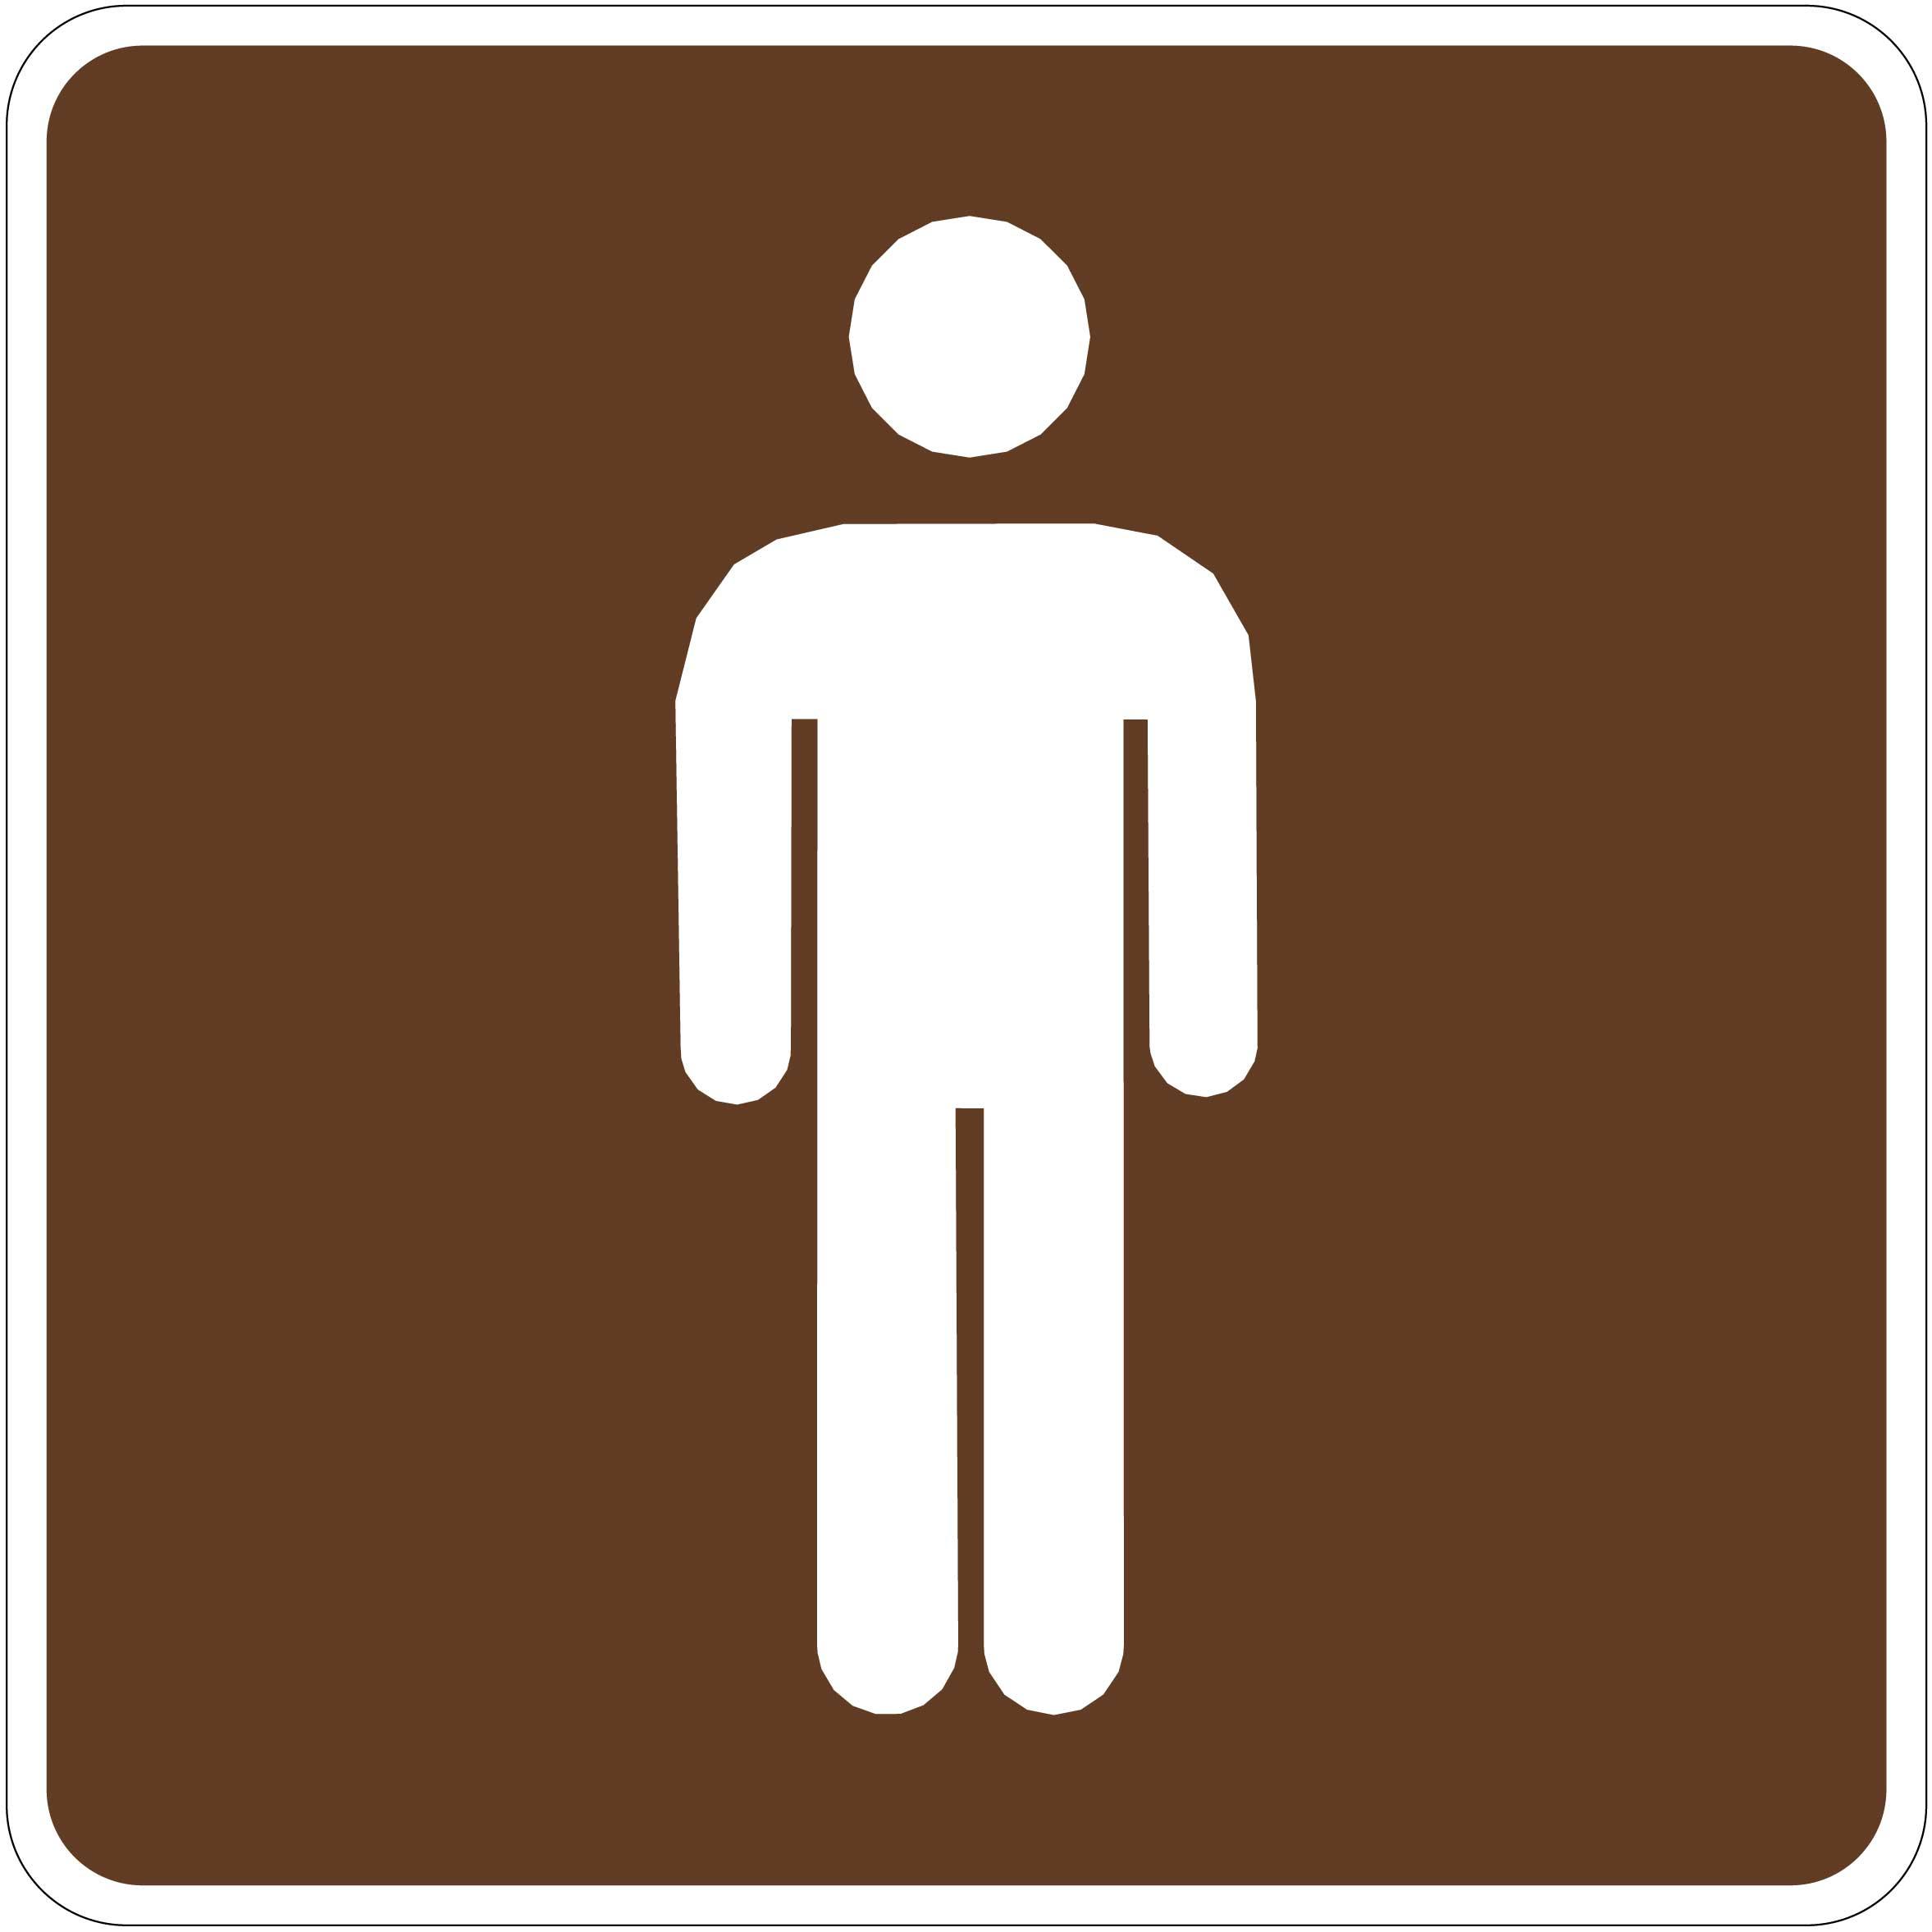 Larger Photo   Outdoor Recreation Signs   Men  39 s Restroom Symbol. Men Bathroom Symbol   ClipArt Best